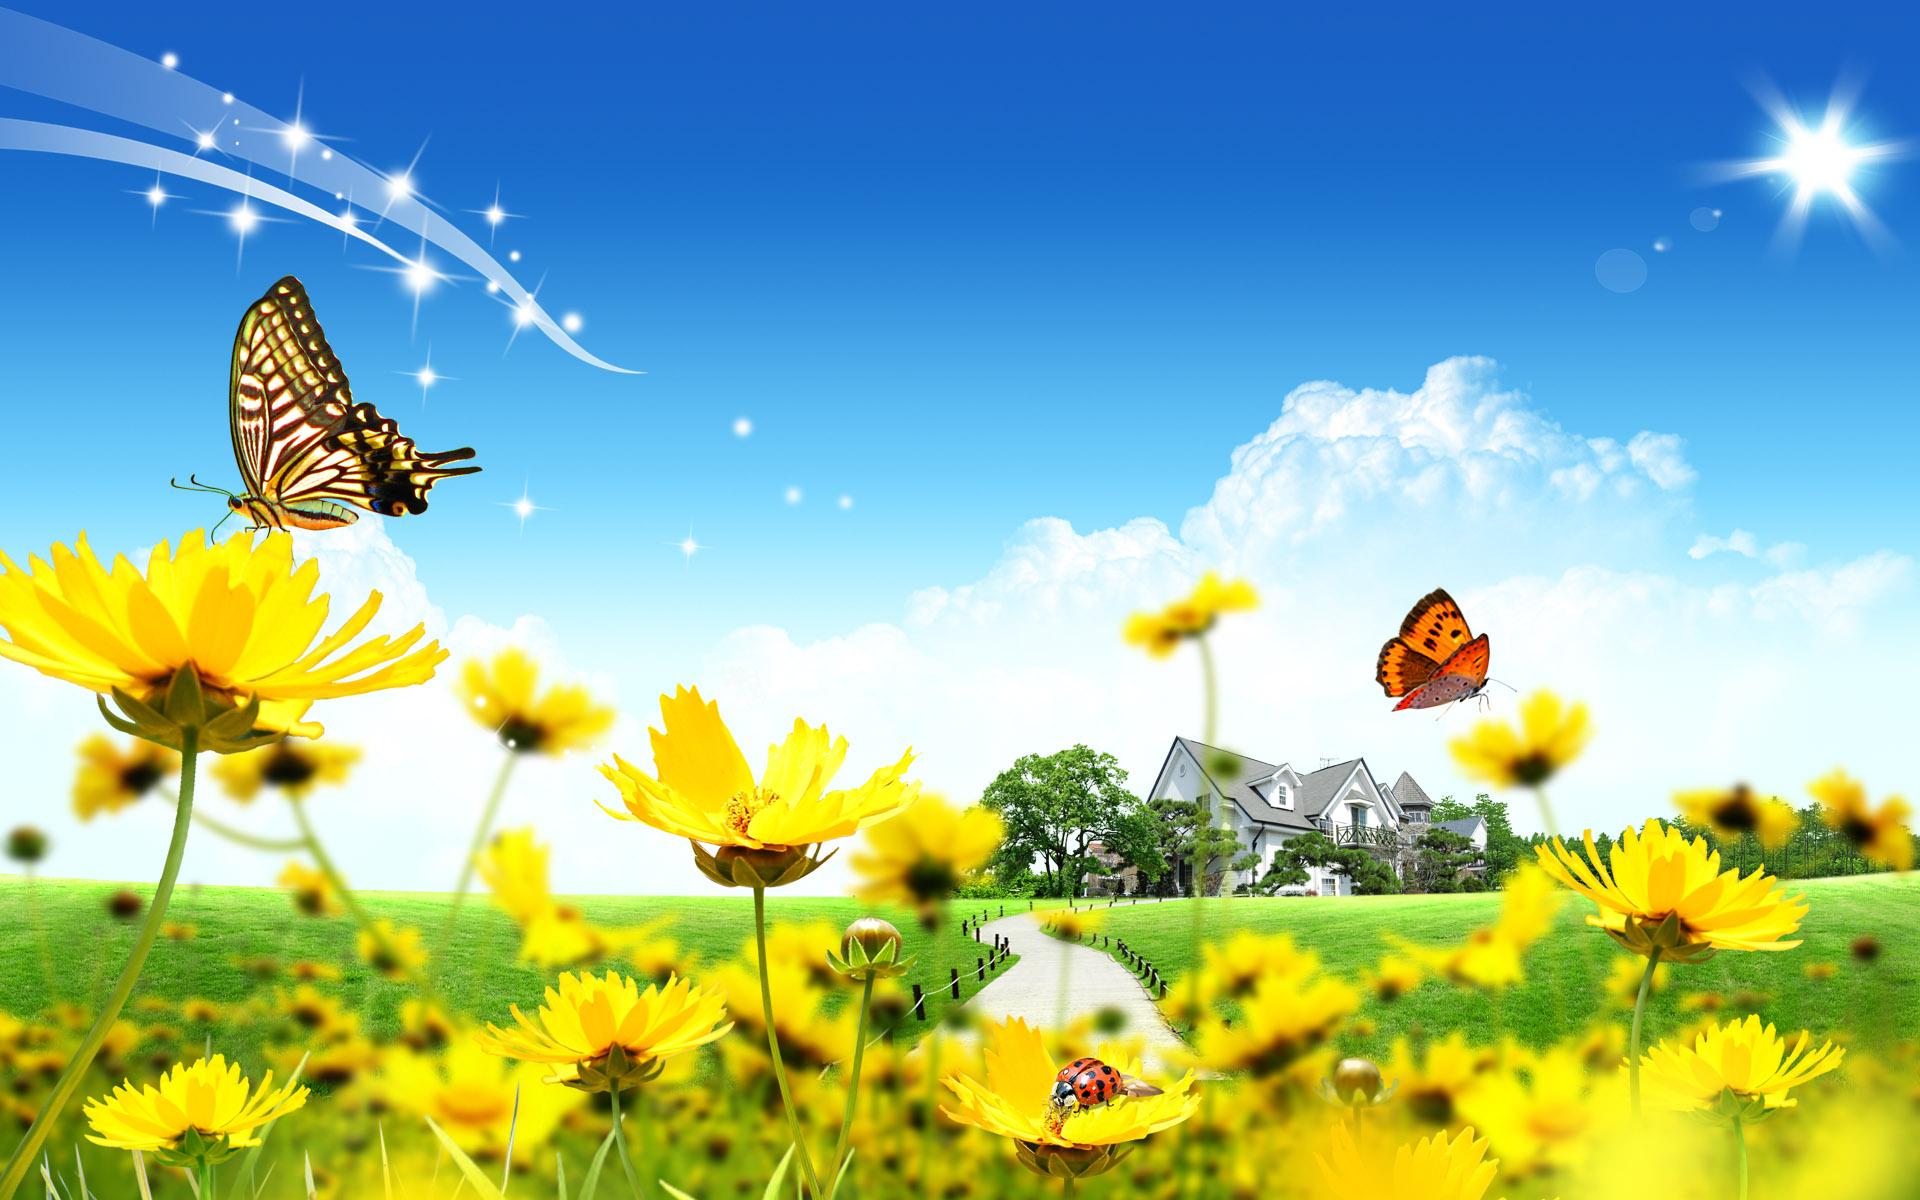 beautiful wallpaper desktop stunning wallpapers spring 1920x1200 1920x1200